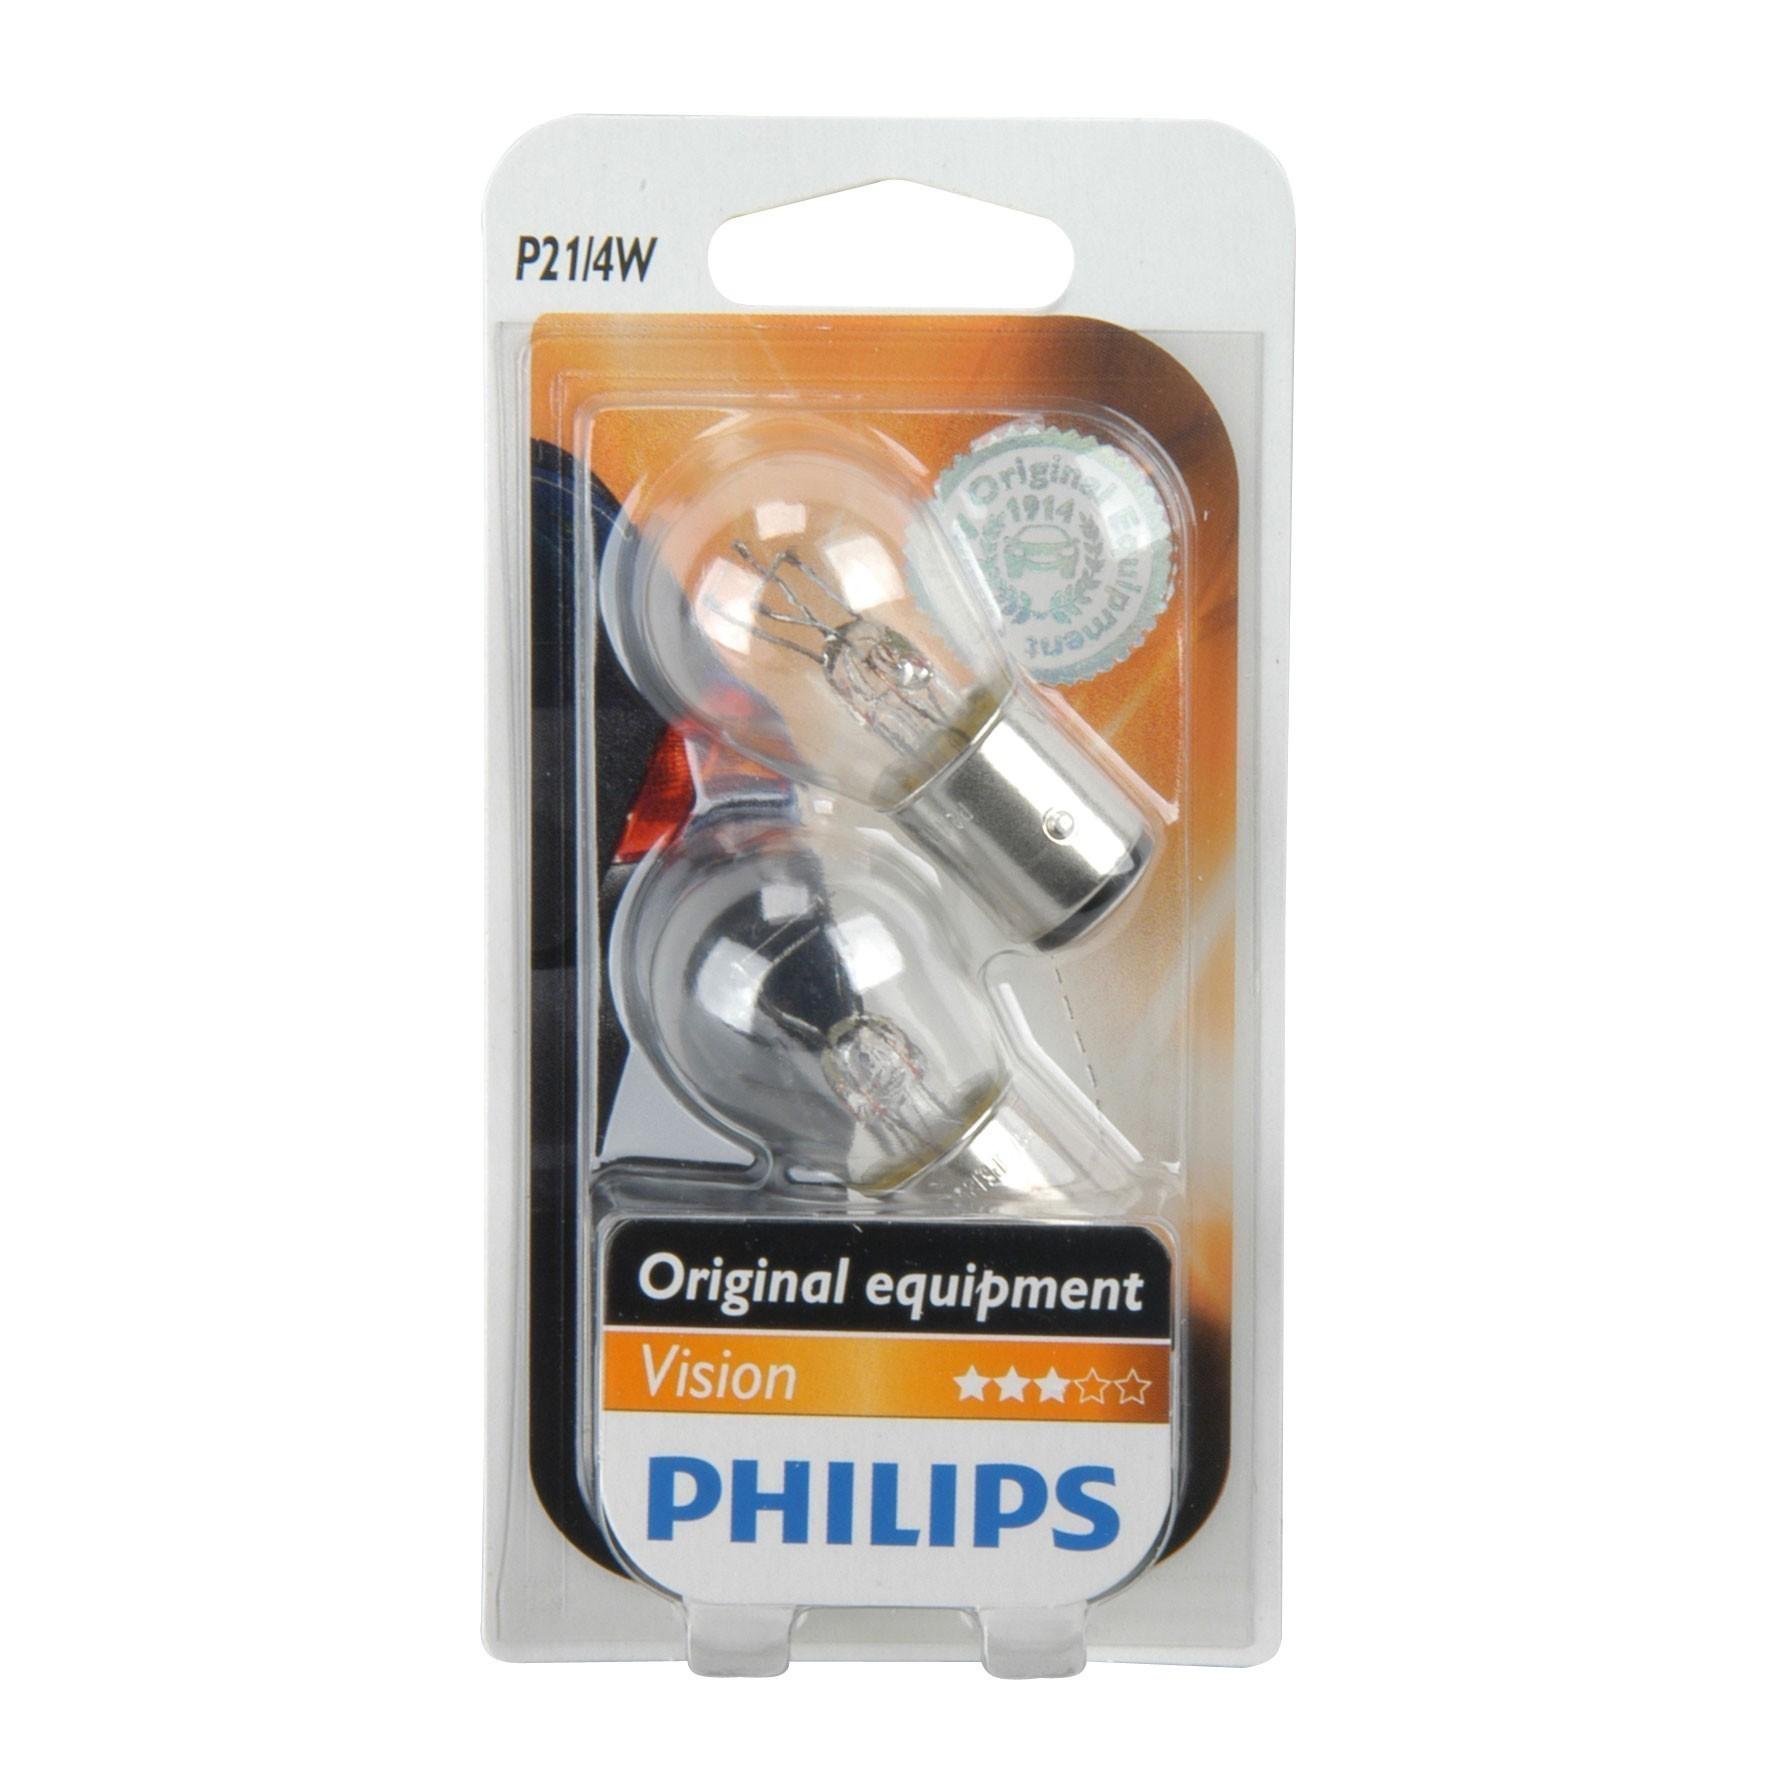 Philips Vision Kugellampe P21/4W 12Volt 2er Pack - Autobeleuchtung Bild 1